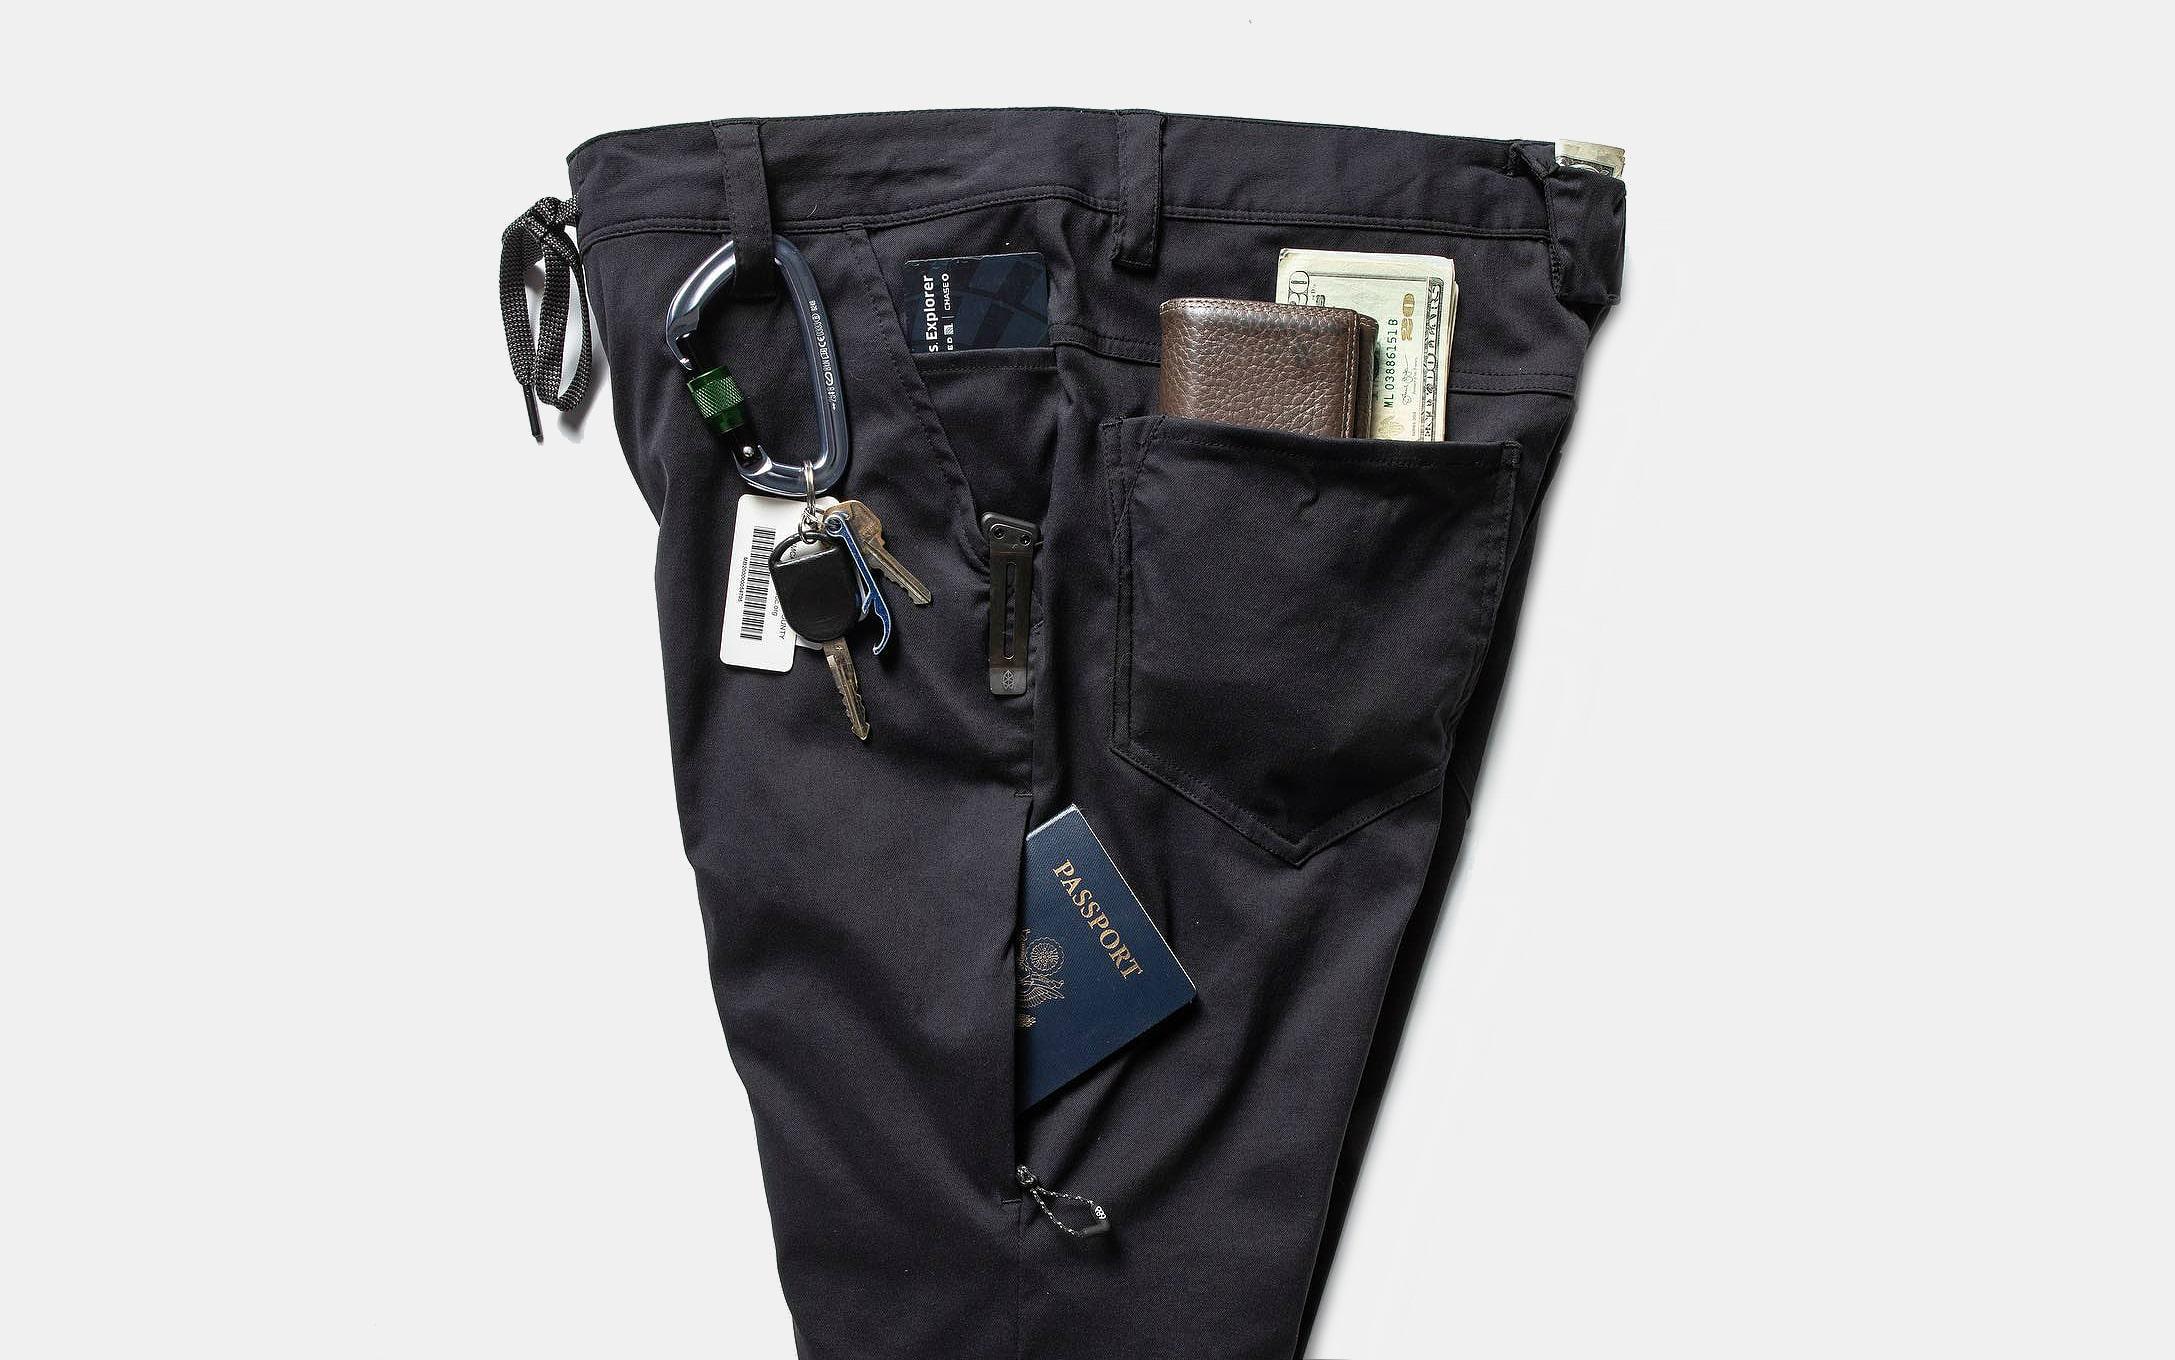 686 Anywhere Multi-Pant